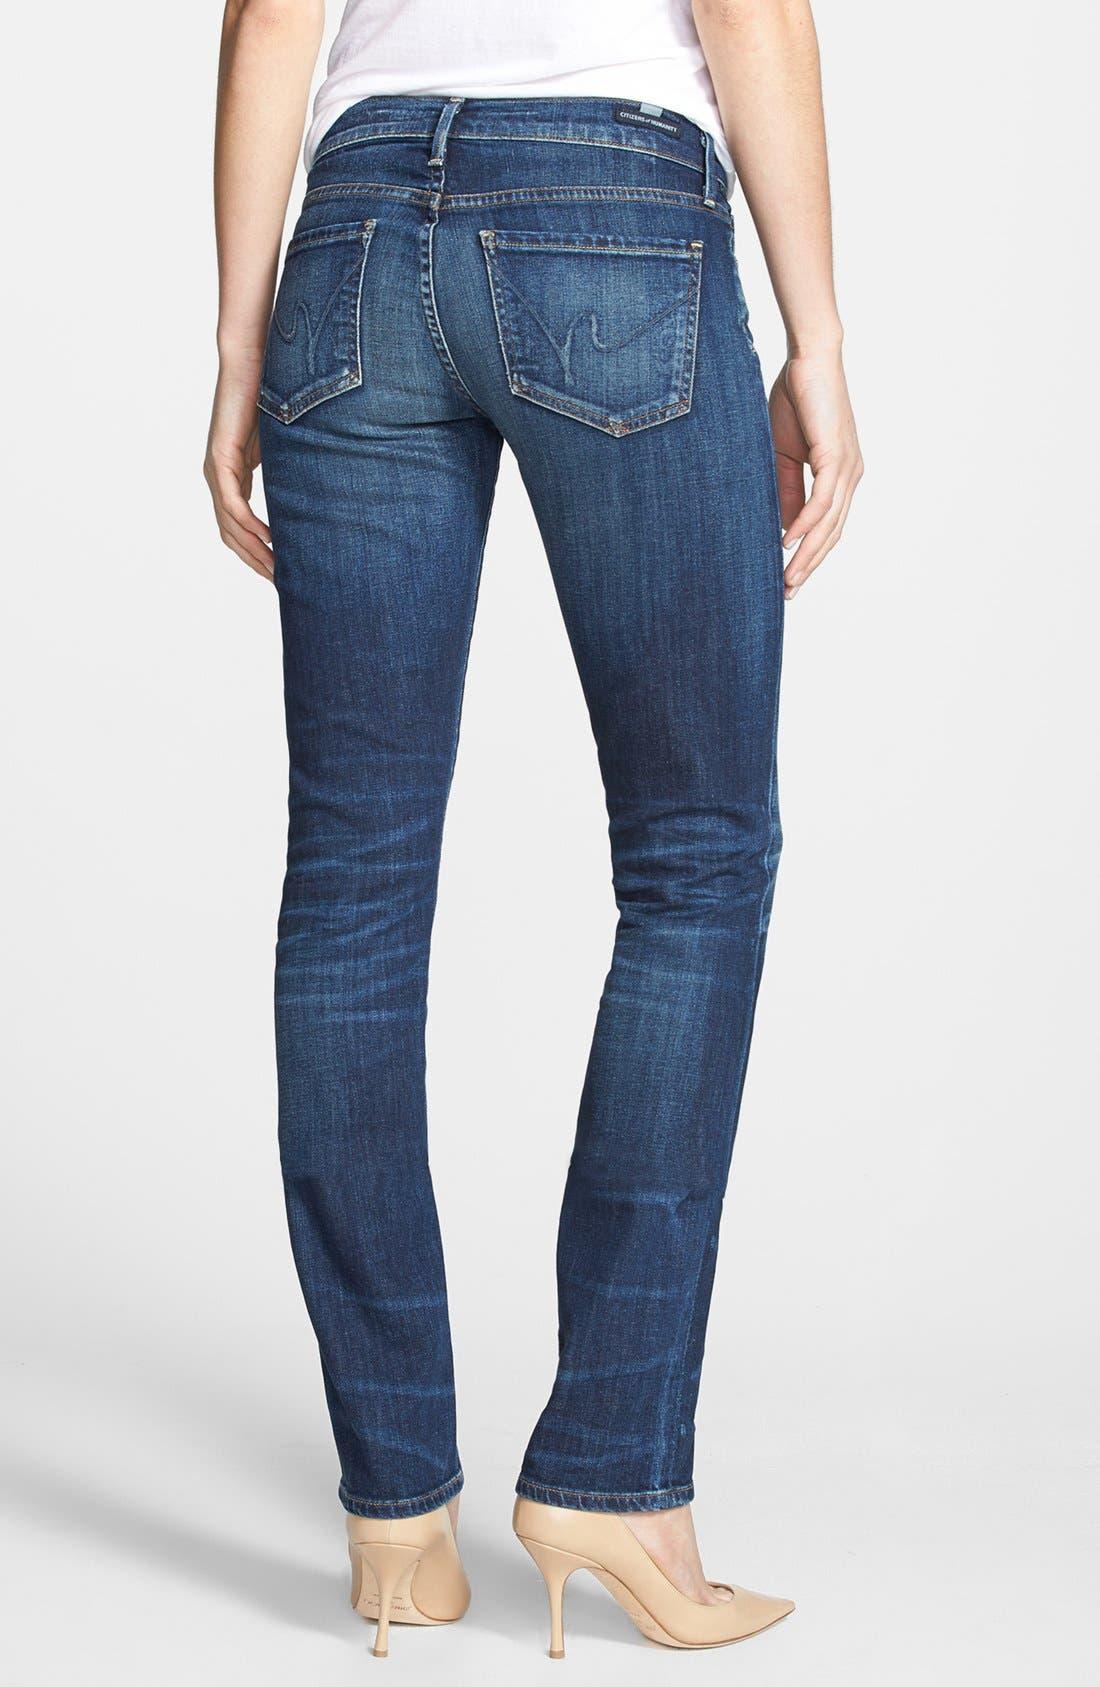 Alternate Image 2  - Citizens of Humanity 'Ava' Straight Leg Jeans (Patina)